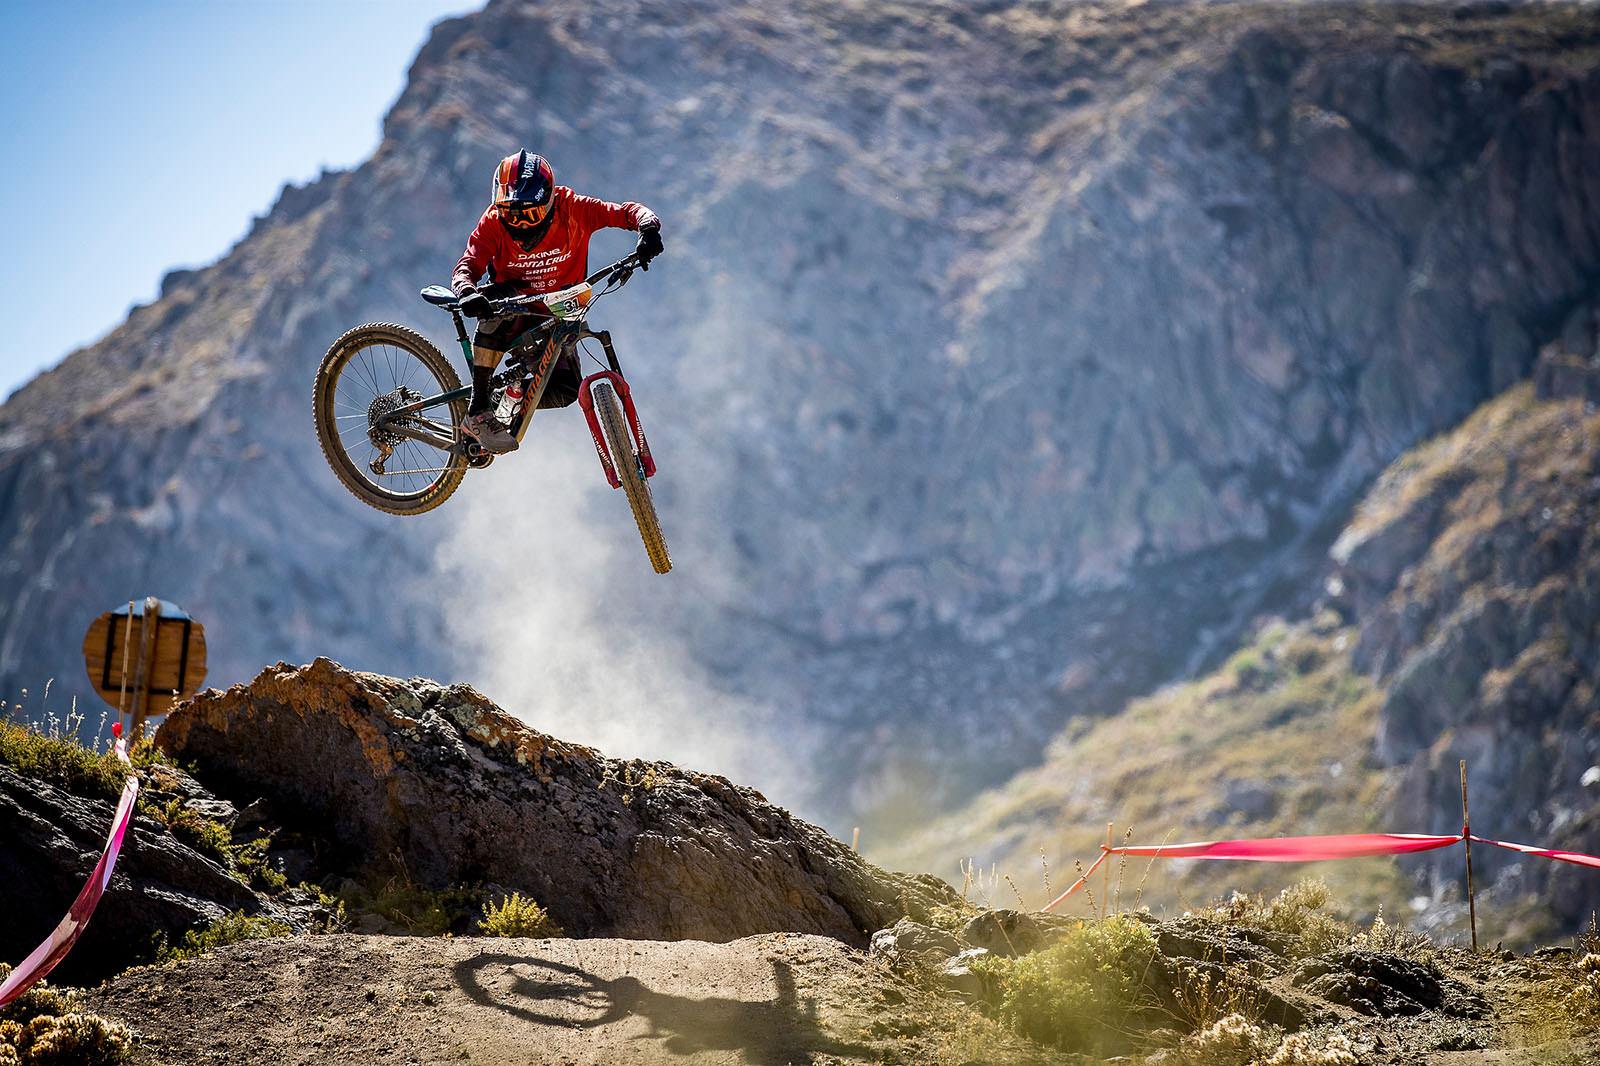 Santa Cruz Bicycles - Iago Garay of Santa Cru X SRAM Enduro Team Making It Look Easy in Chile